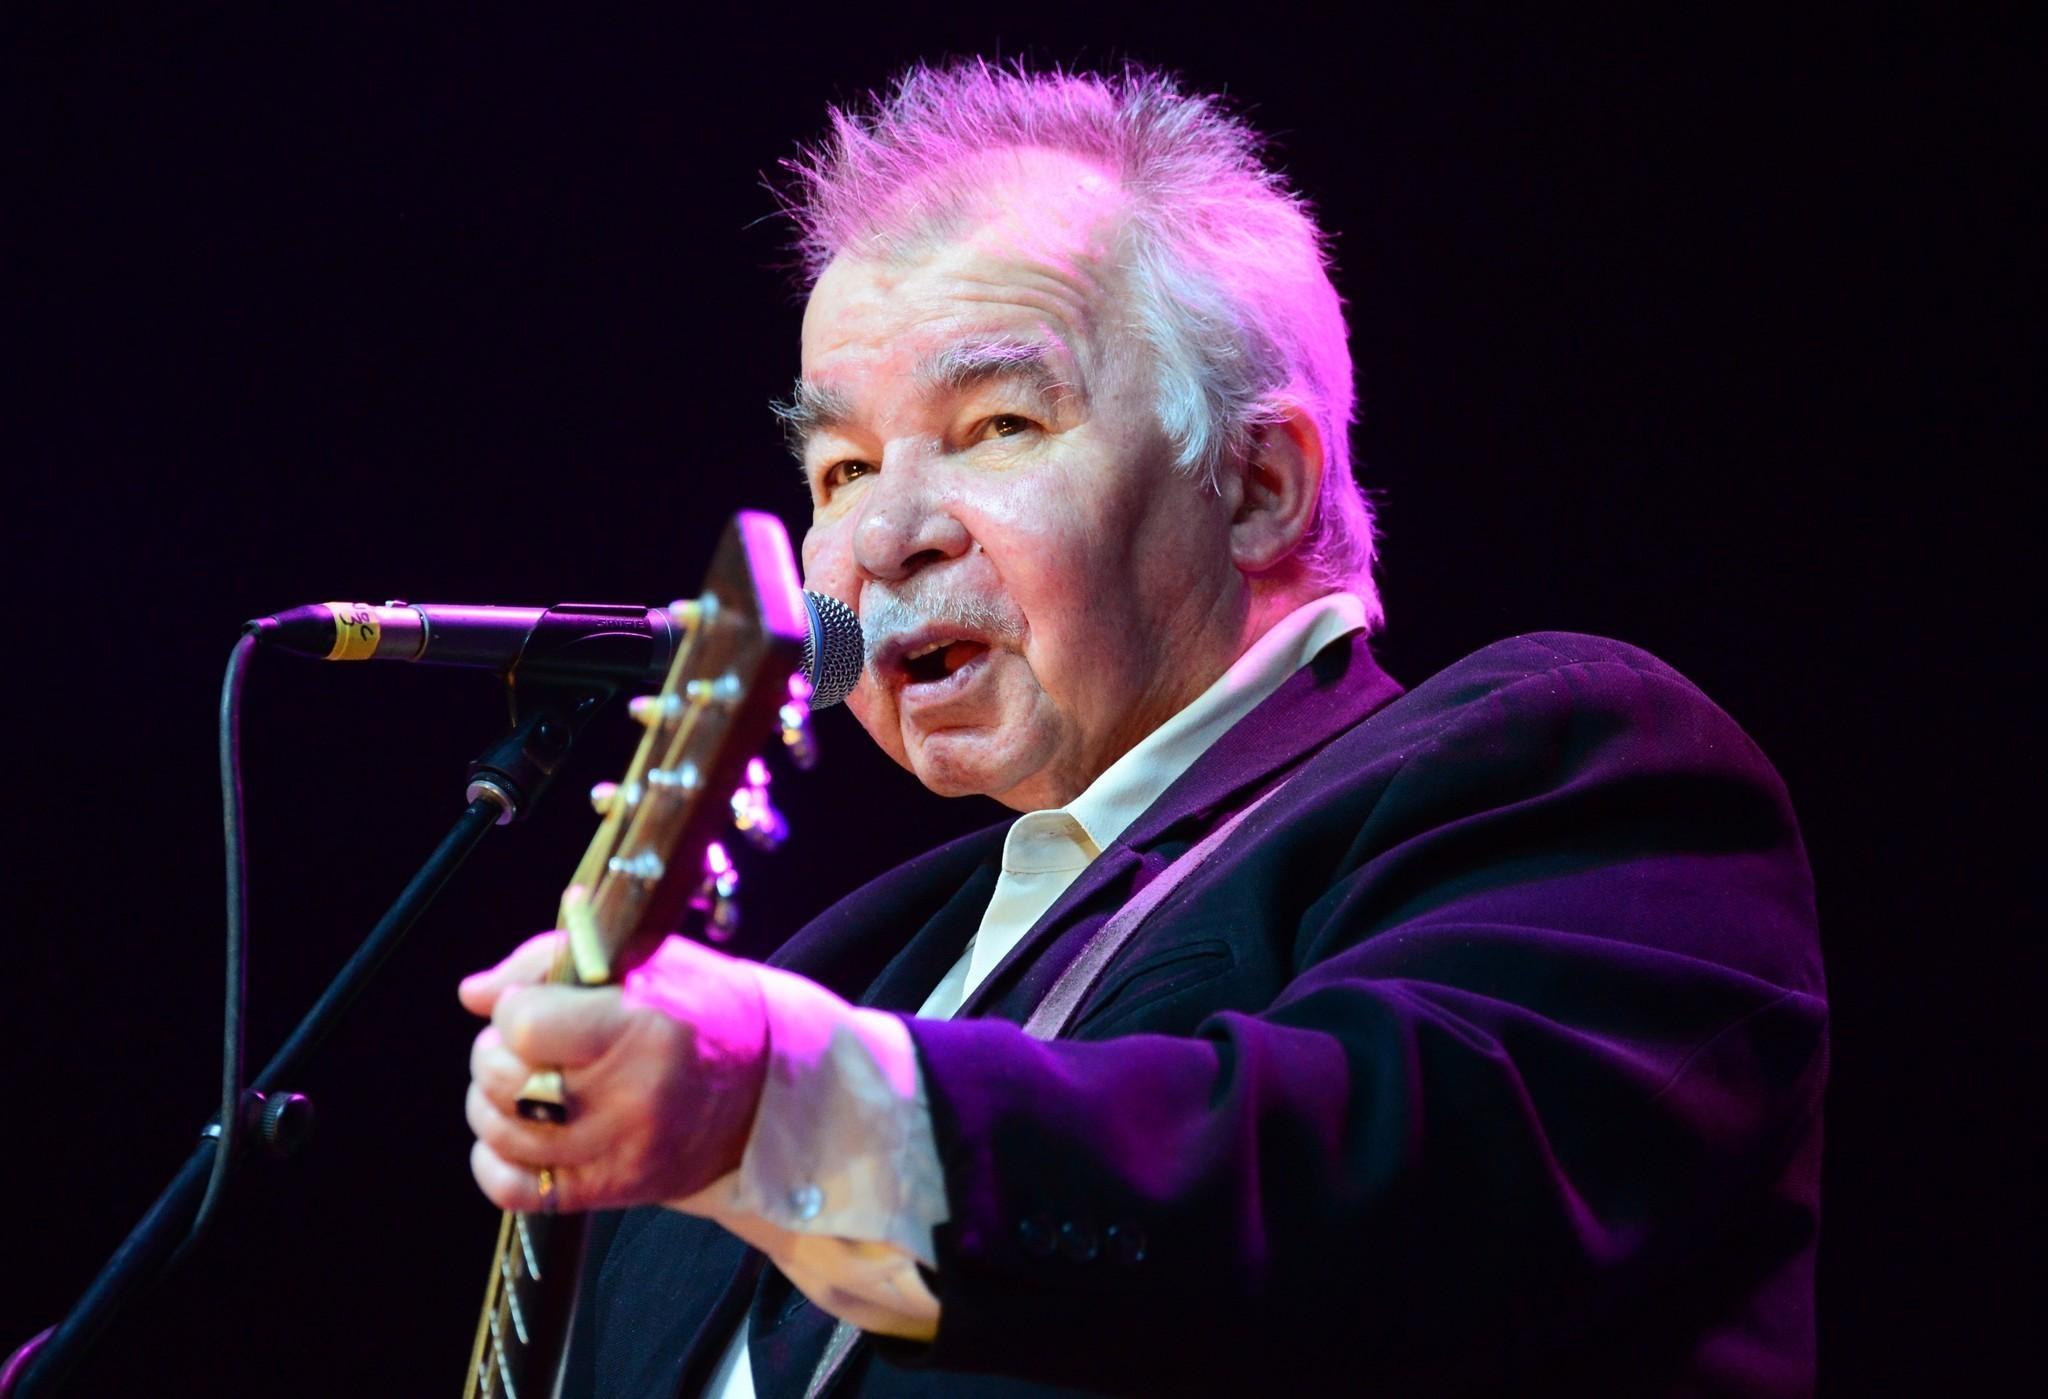 Songwriter John Prine hospitalized with coronavirus symptoms